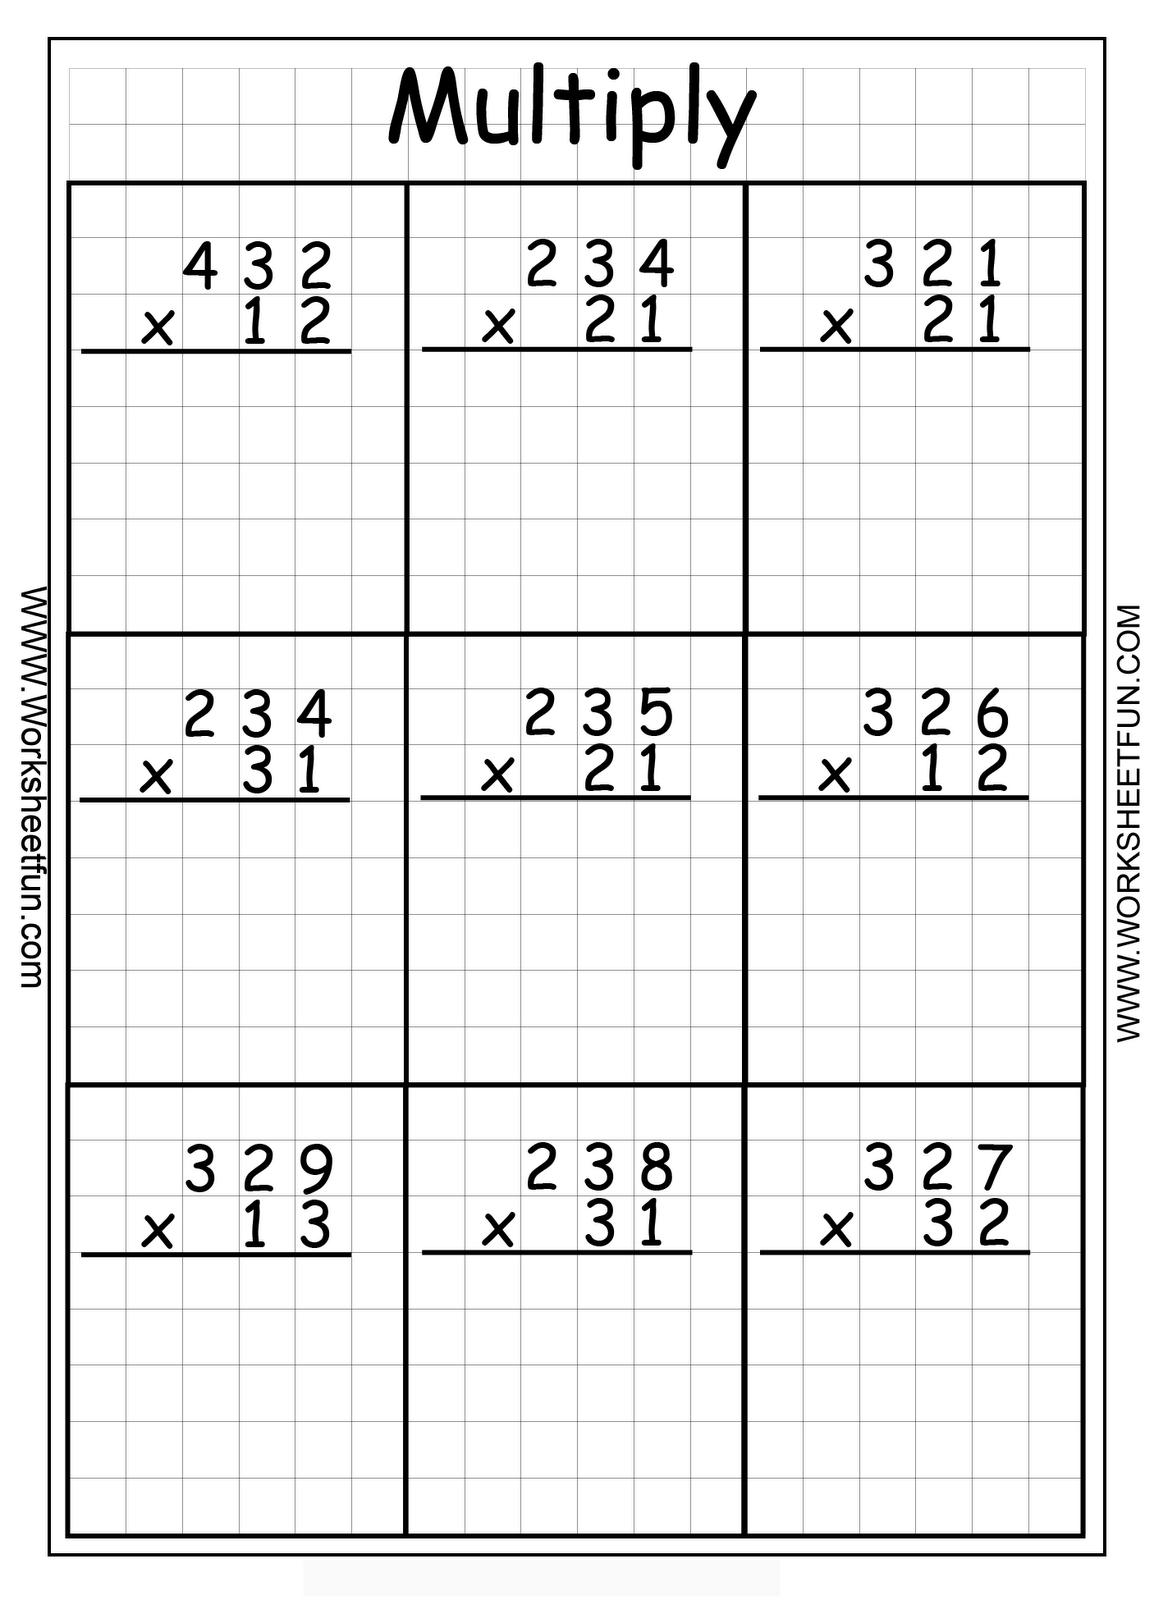 2 Digit By 1 Digit Multiplication Worksheets On Graph Paper Vatoz